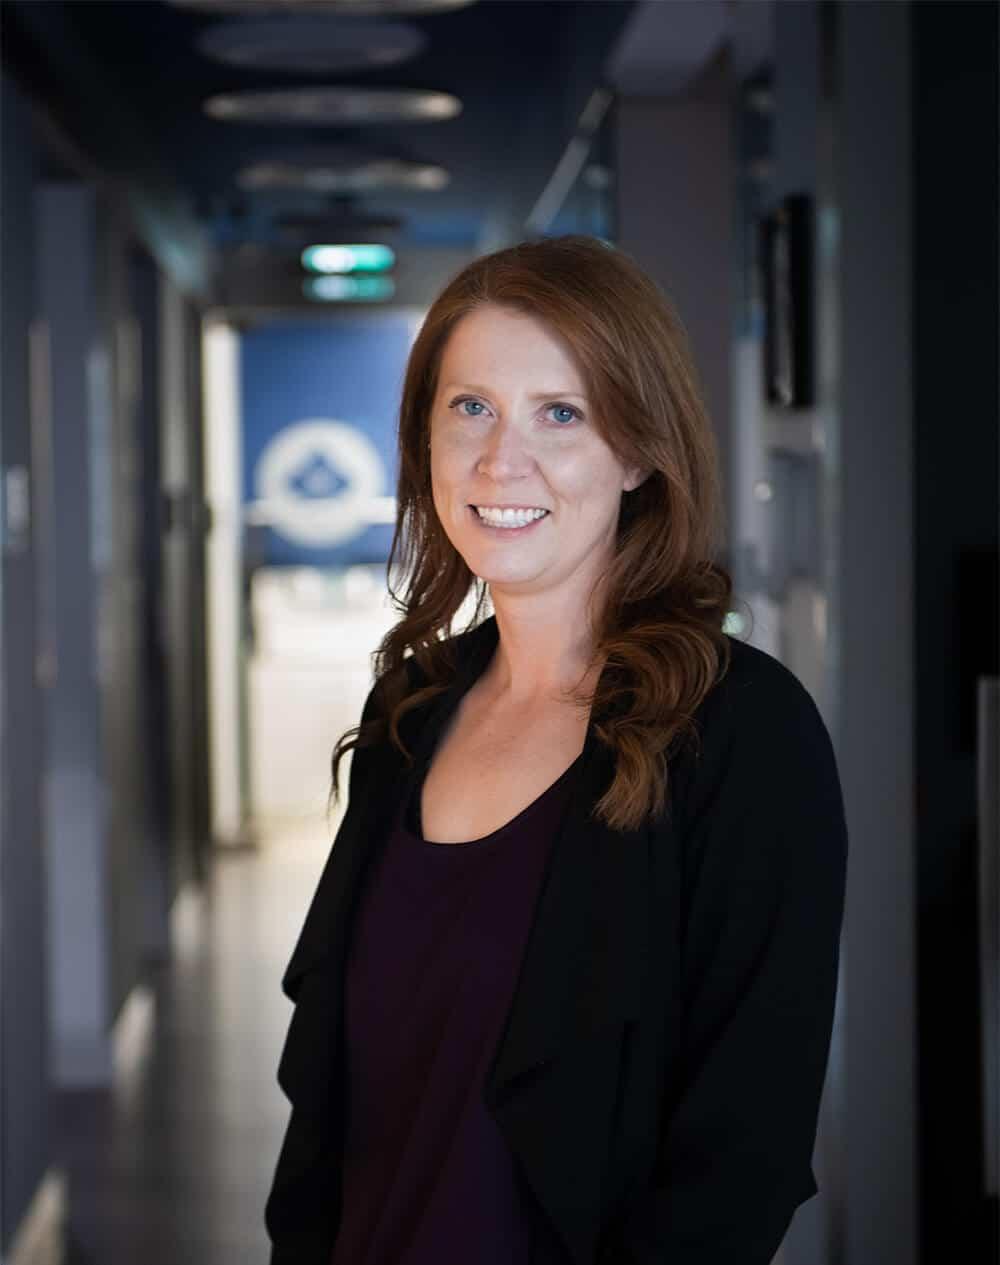 Dr. Laura Caylor, Dentist at NOVO Dental Centre